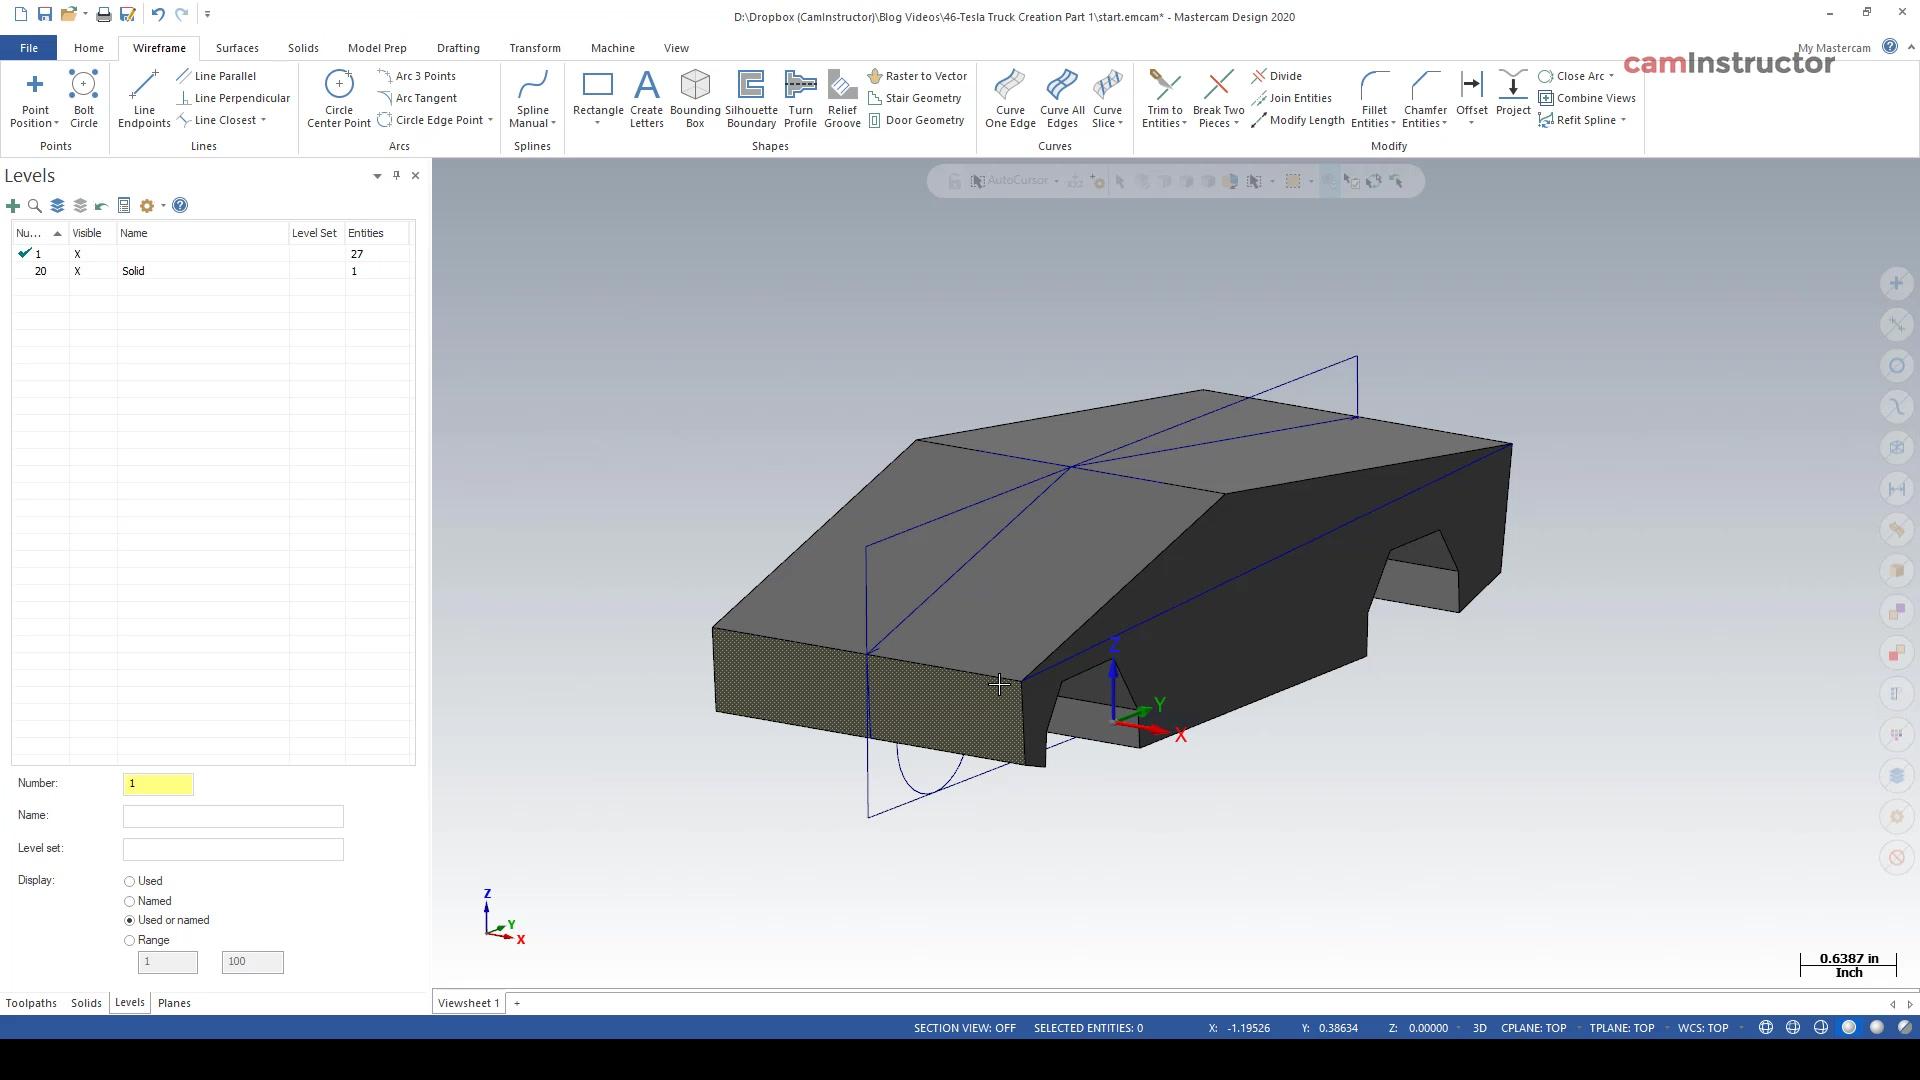 Tesla Truck Creation Part 2